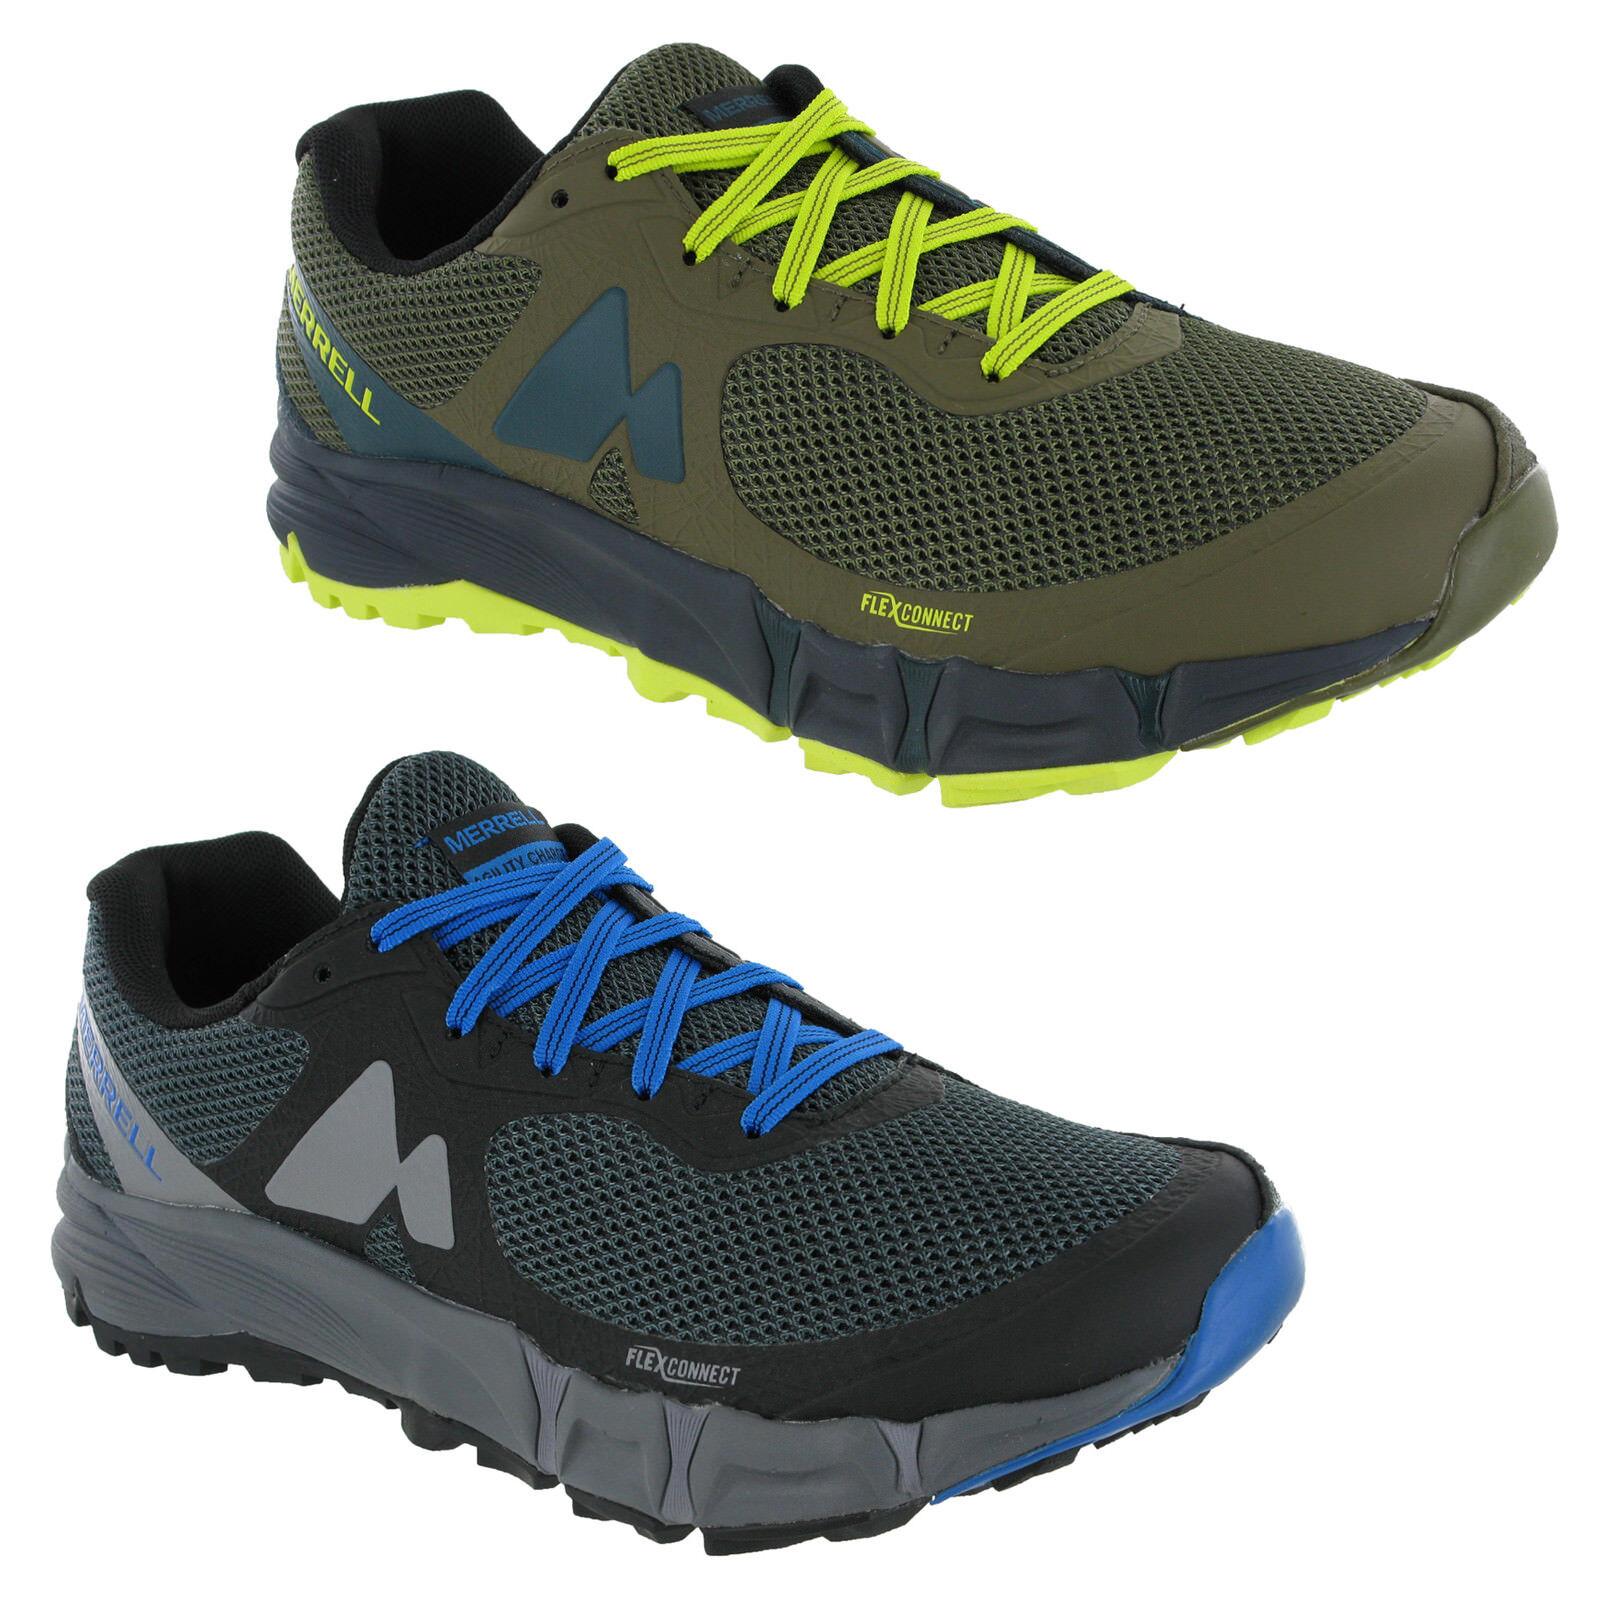 merrell cheap sandals size 6, Merrell Agility Charge Flex